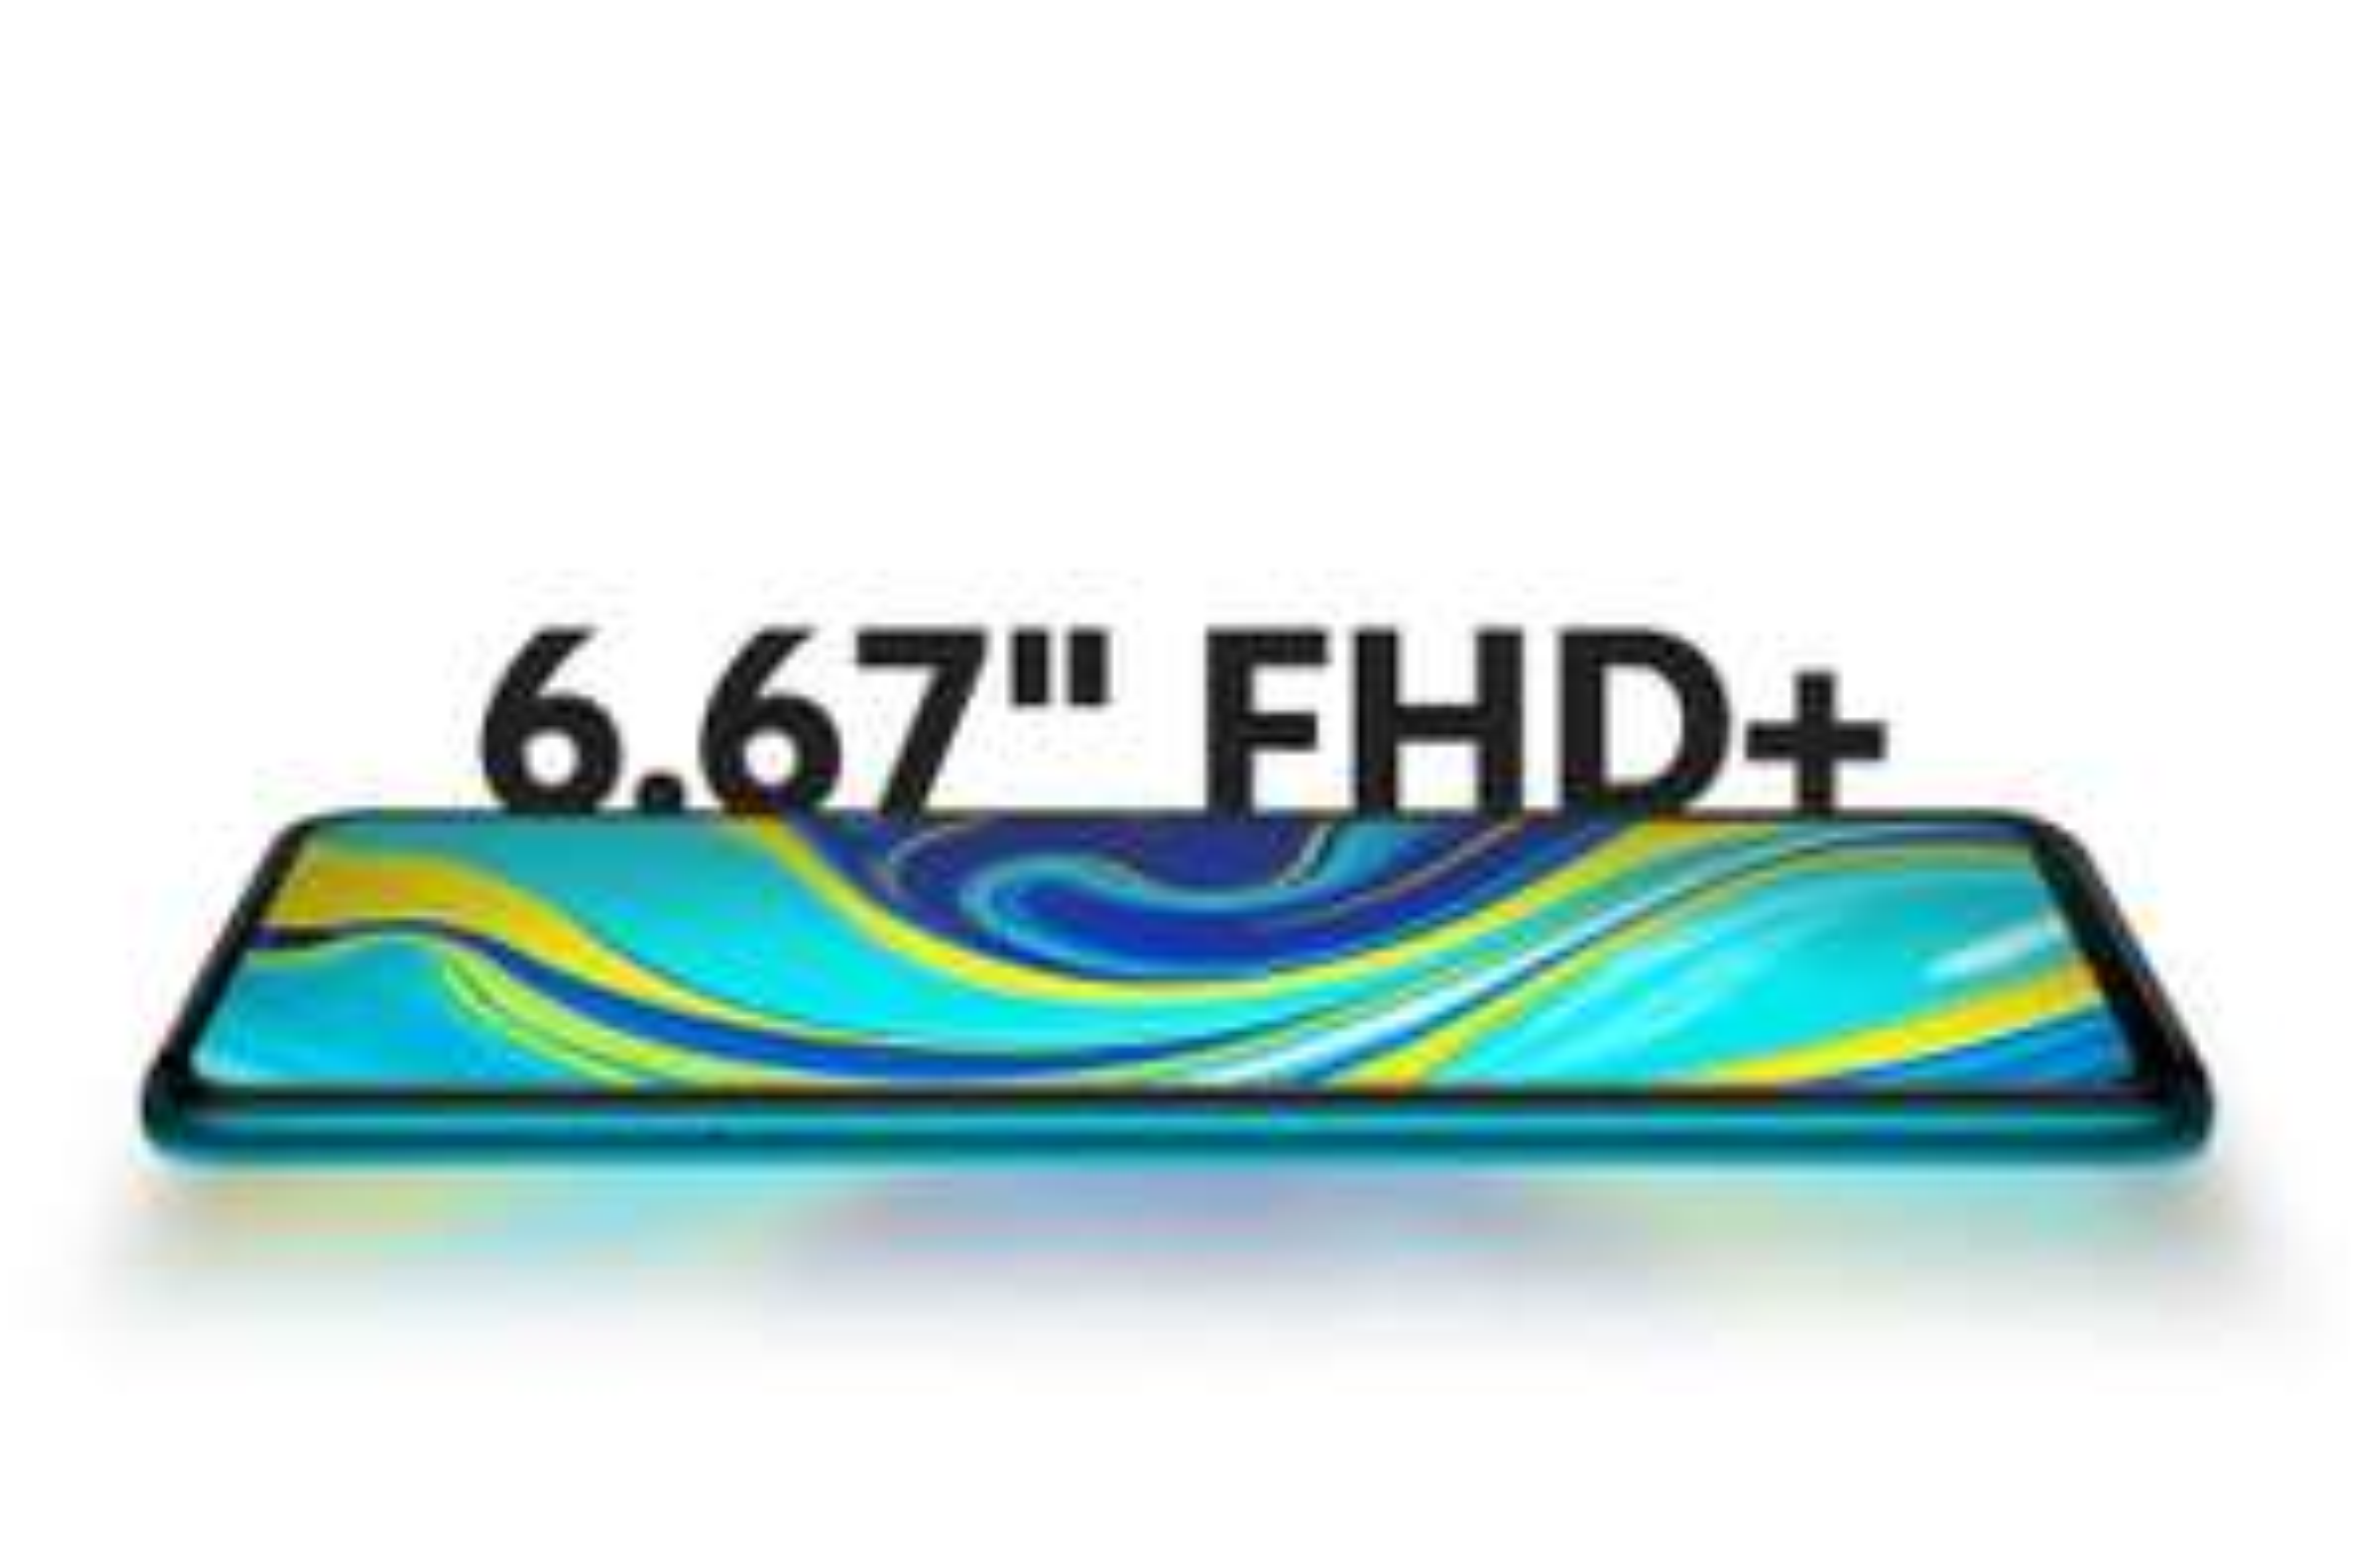 Xiaomi Redmi Note 9S 4 + 64GB, 48 MP Kamera, 5020 mAh Akku, offizieller Mi Store, Versand aus D, 24 h